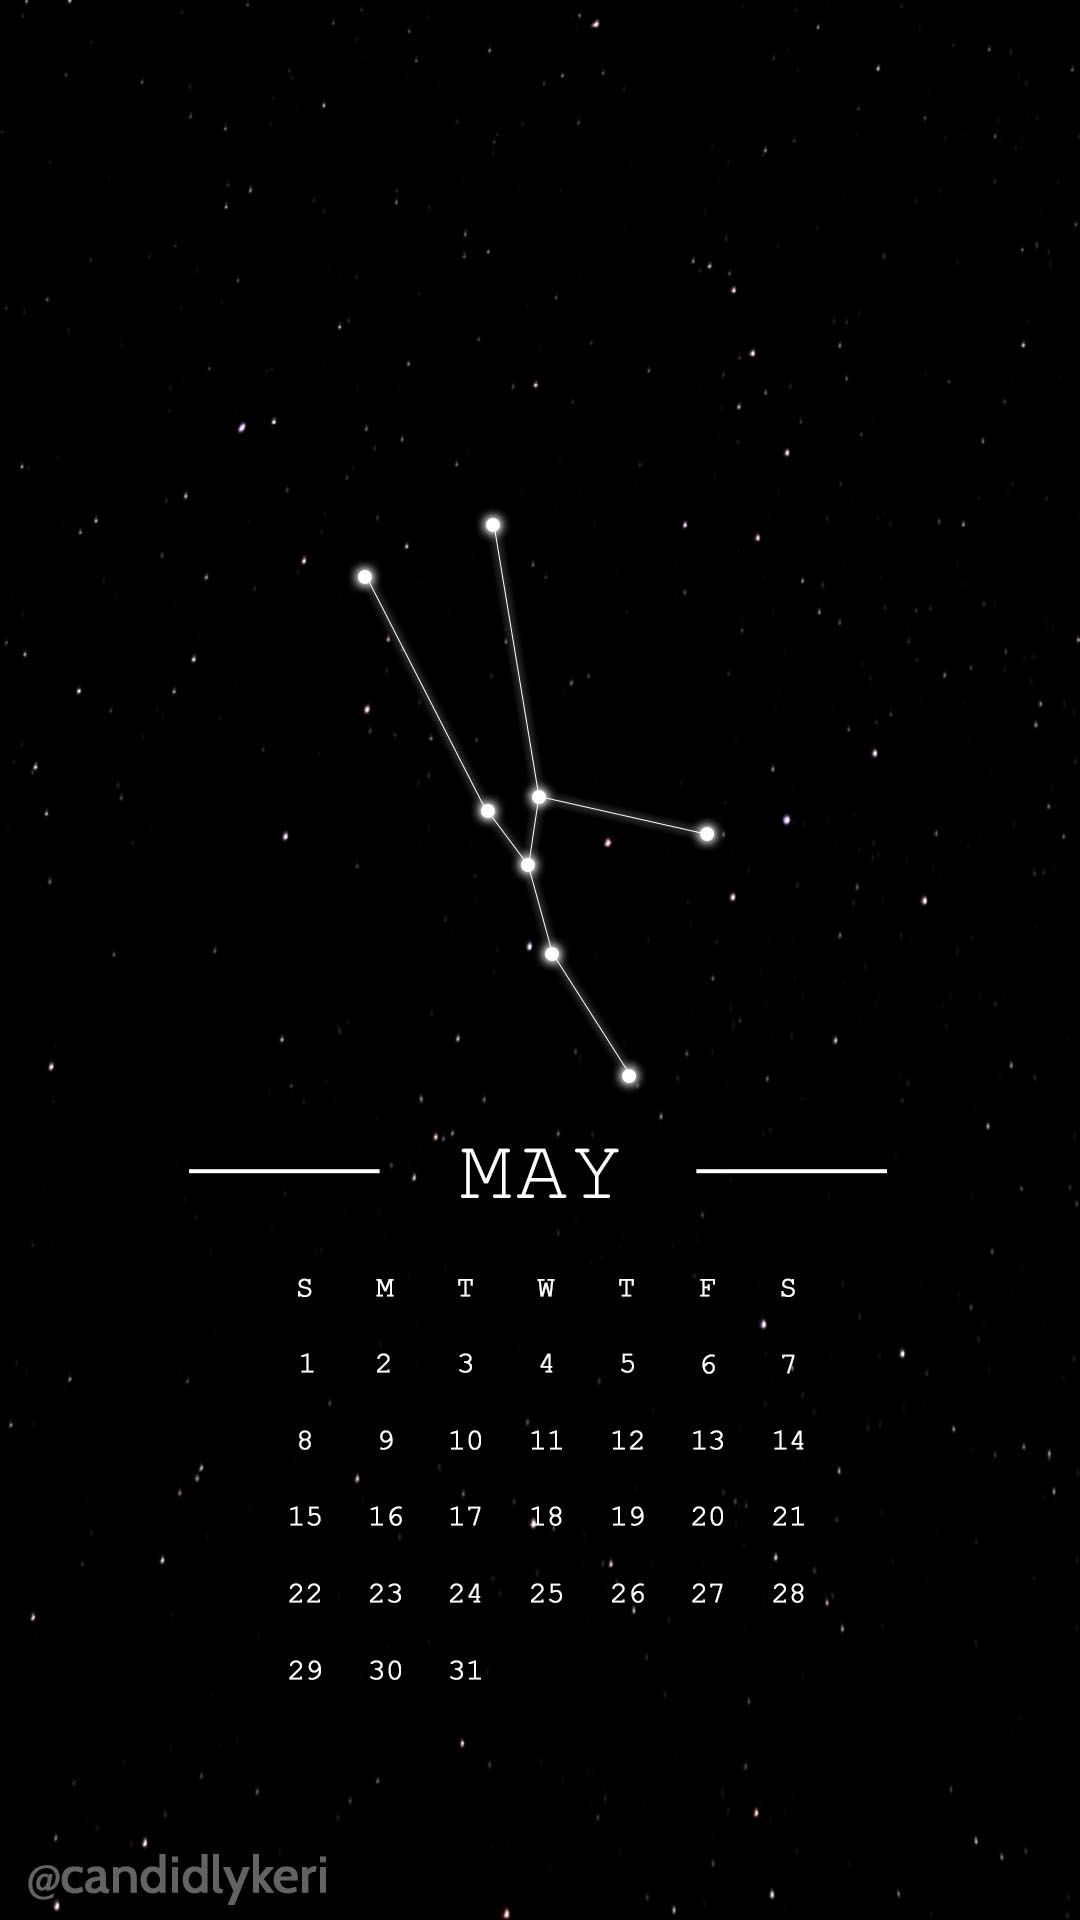 Taurus constellation horoscope may 2016 calendar wallpaper 1080x1920